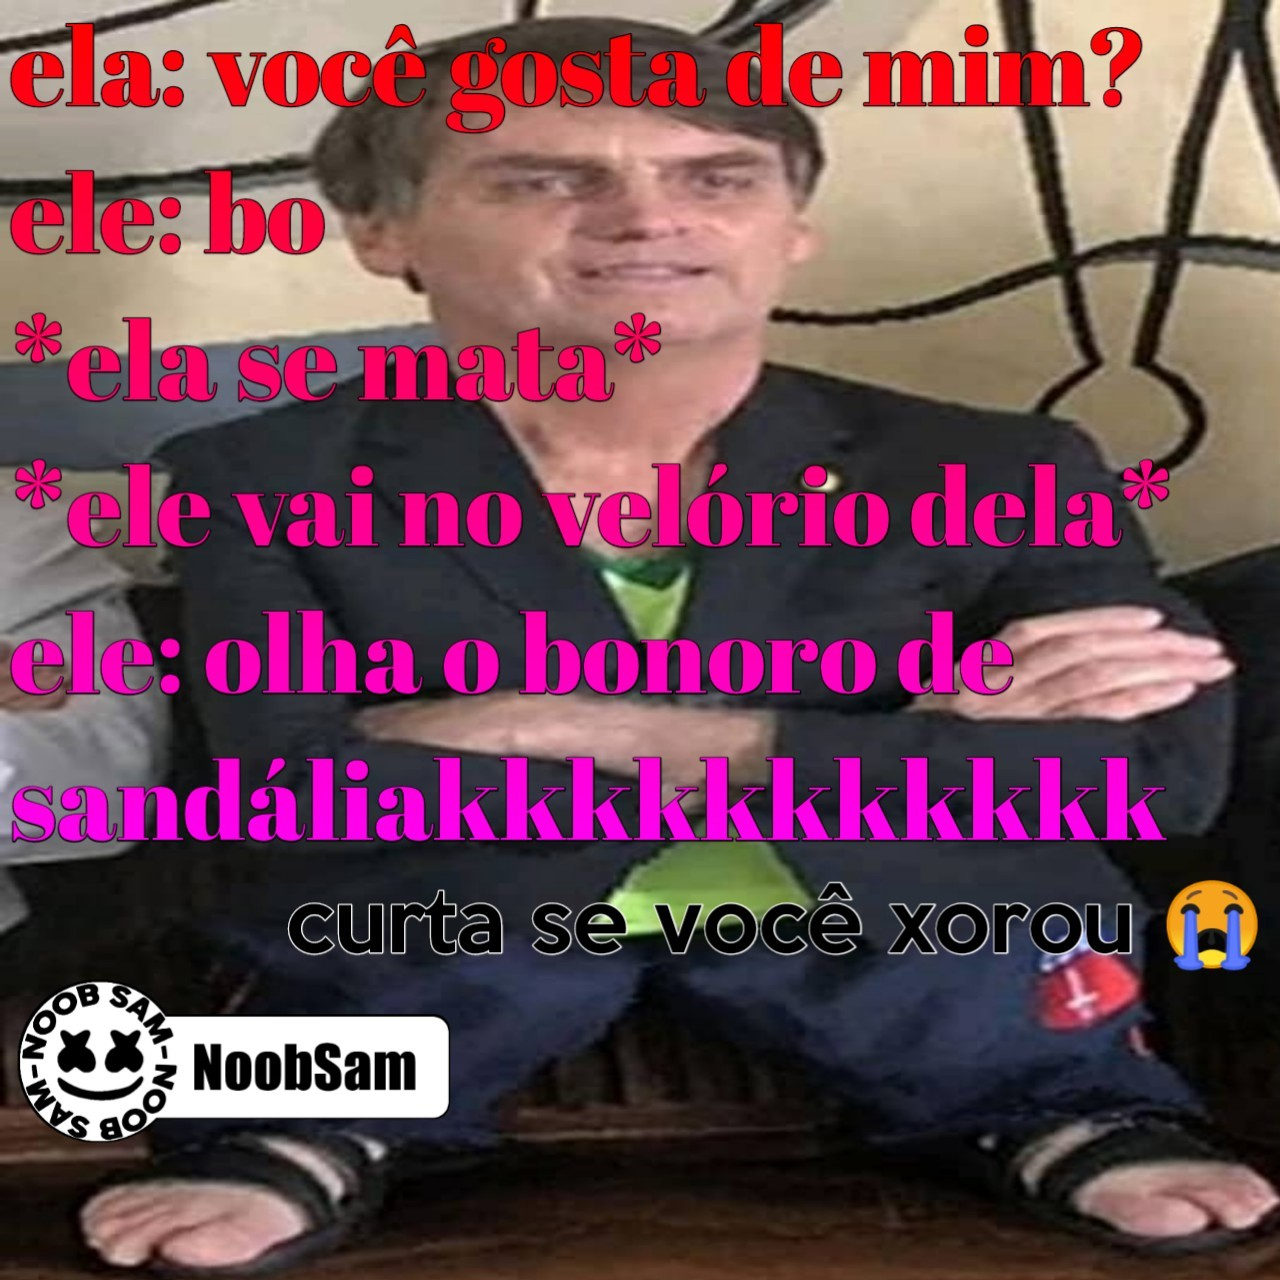 Olha o bonoro de sandaliakkkkkkkkk - meme